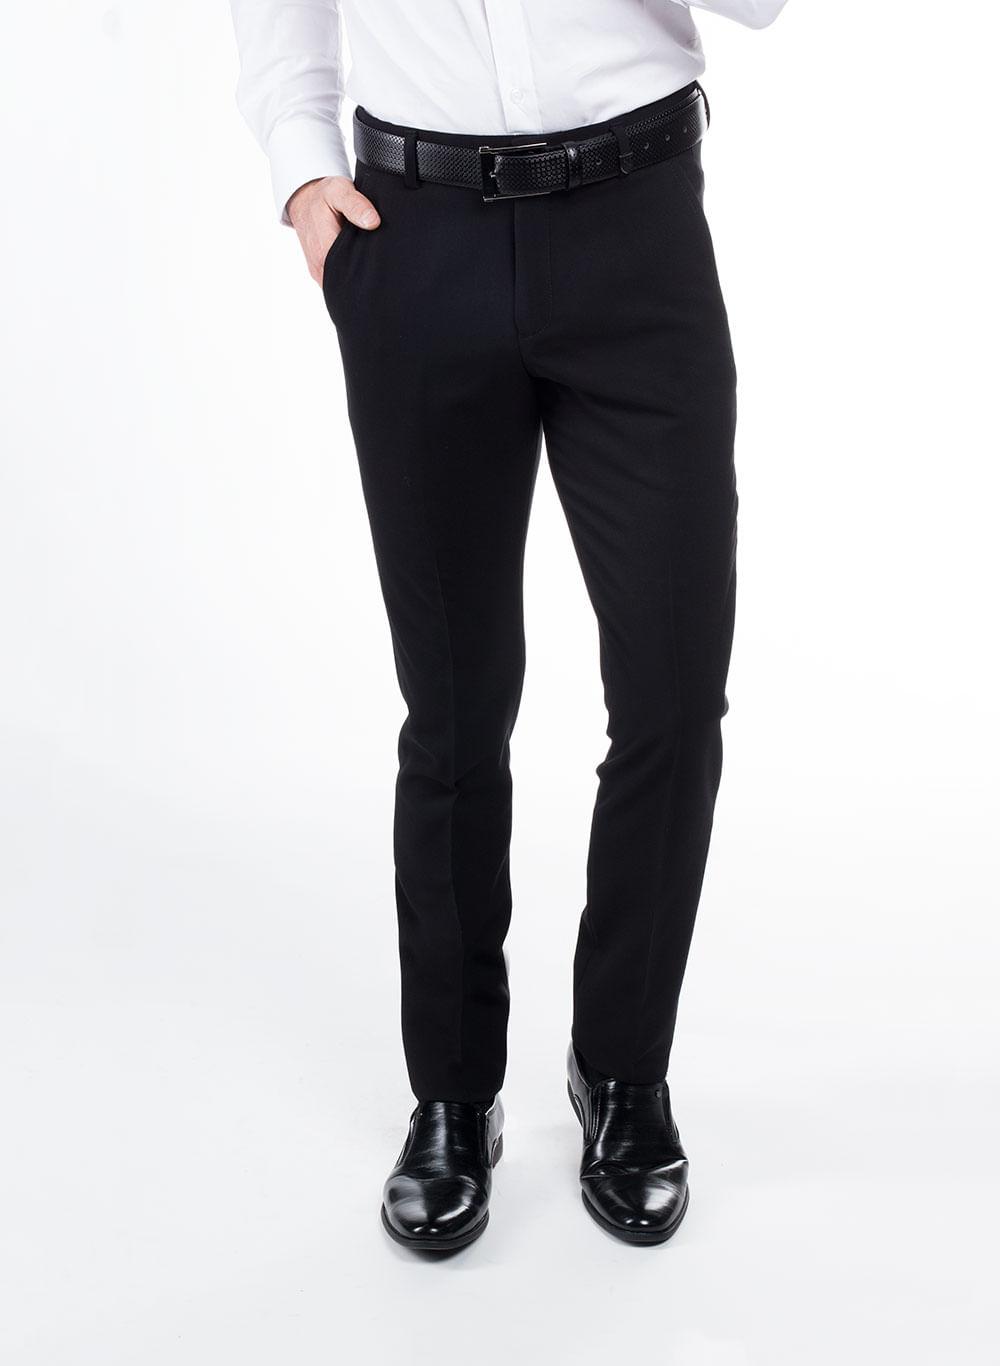 Pantalon De Vestir Color Negro Marca Aldo Conti Lexus